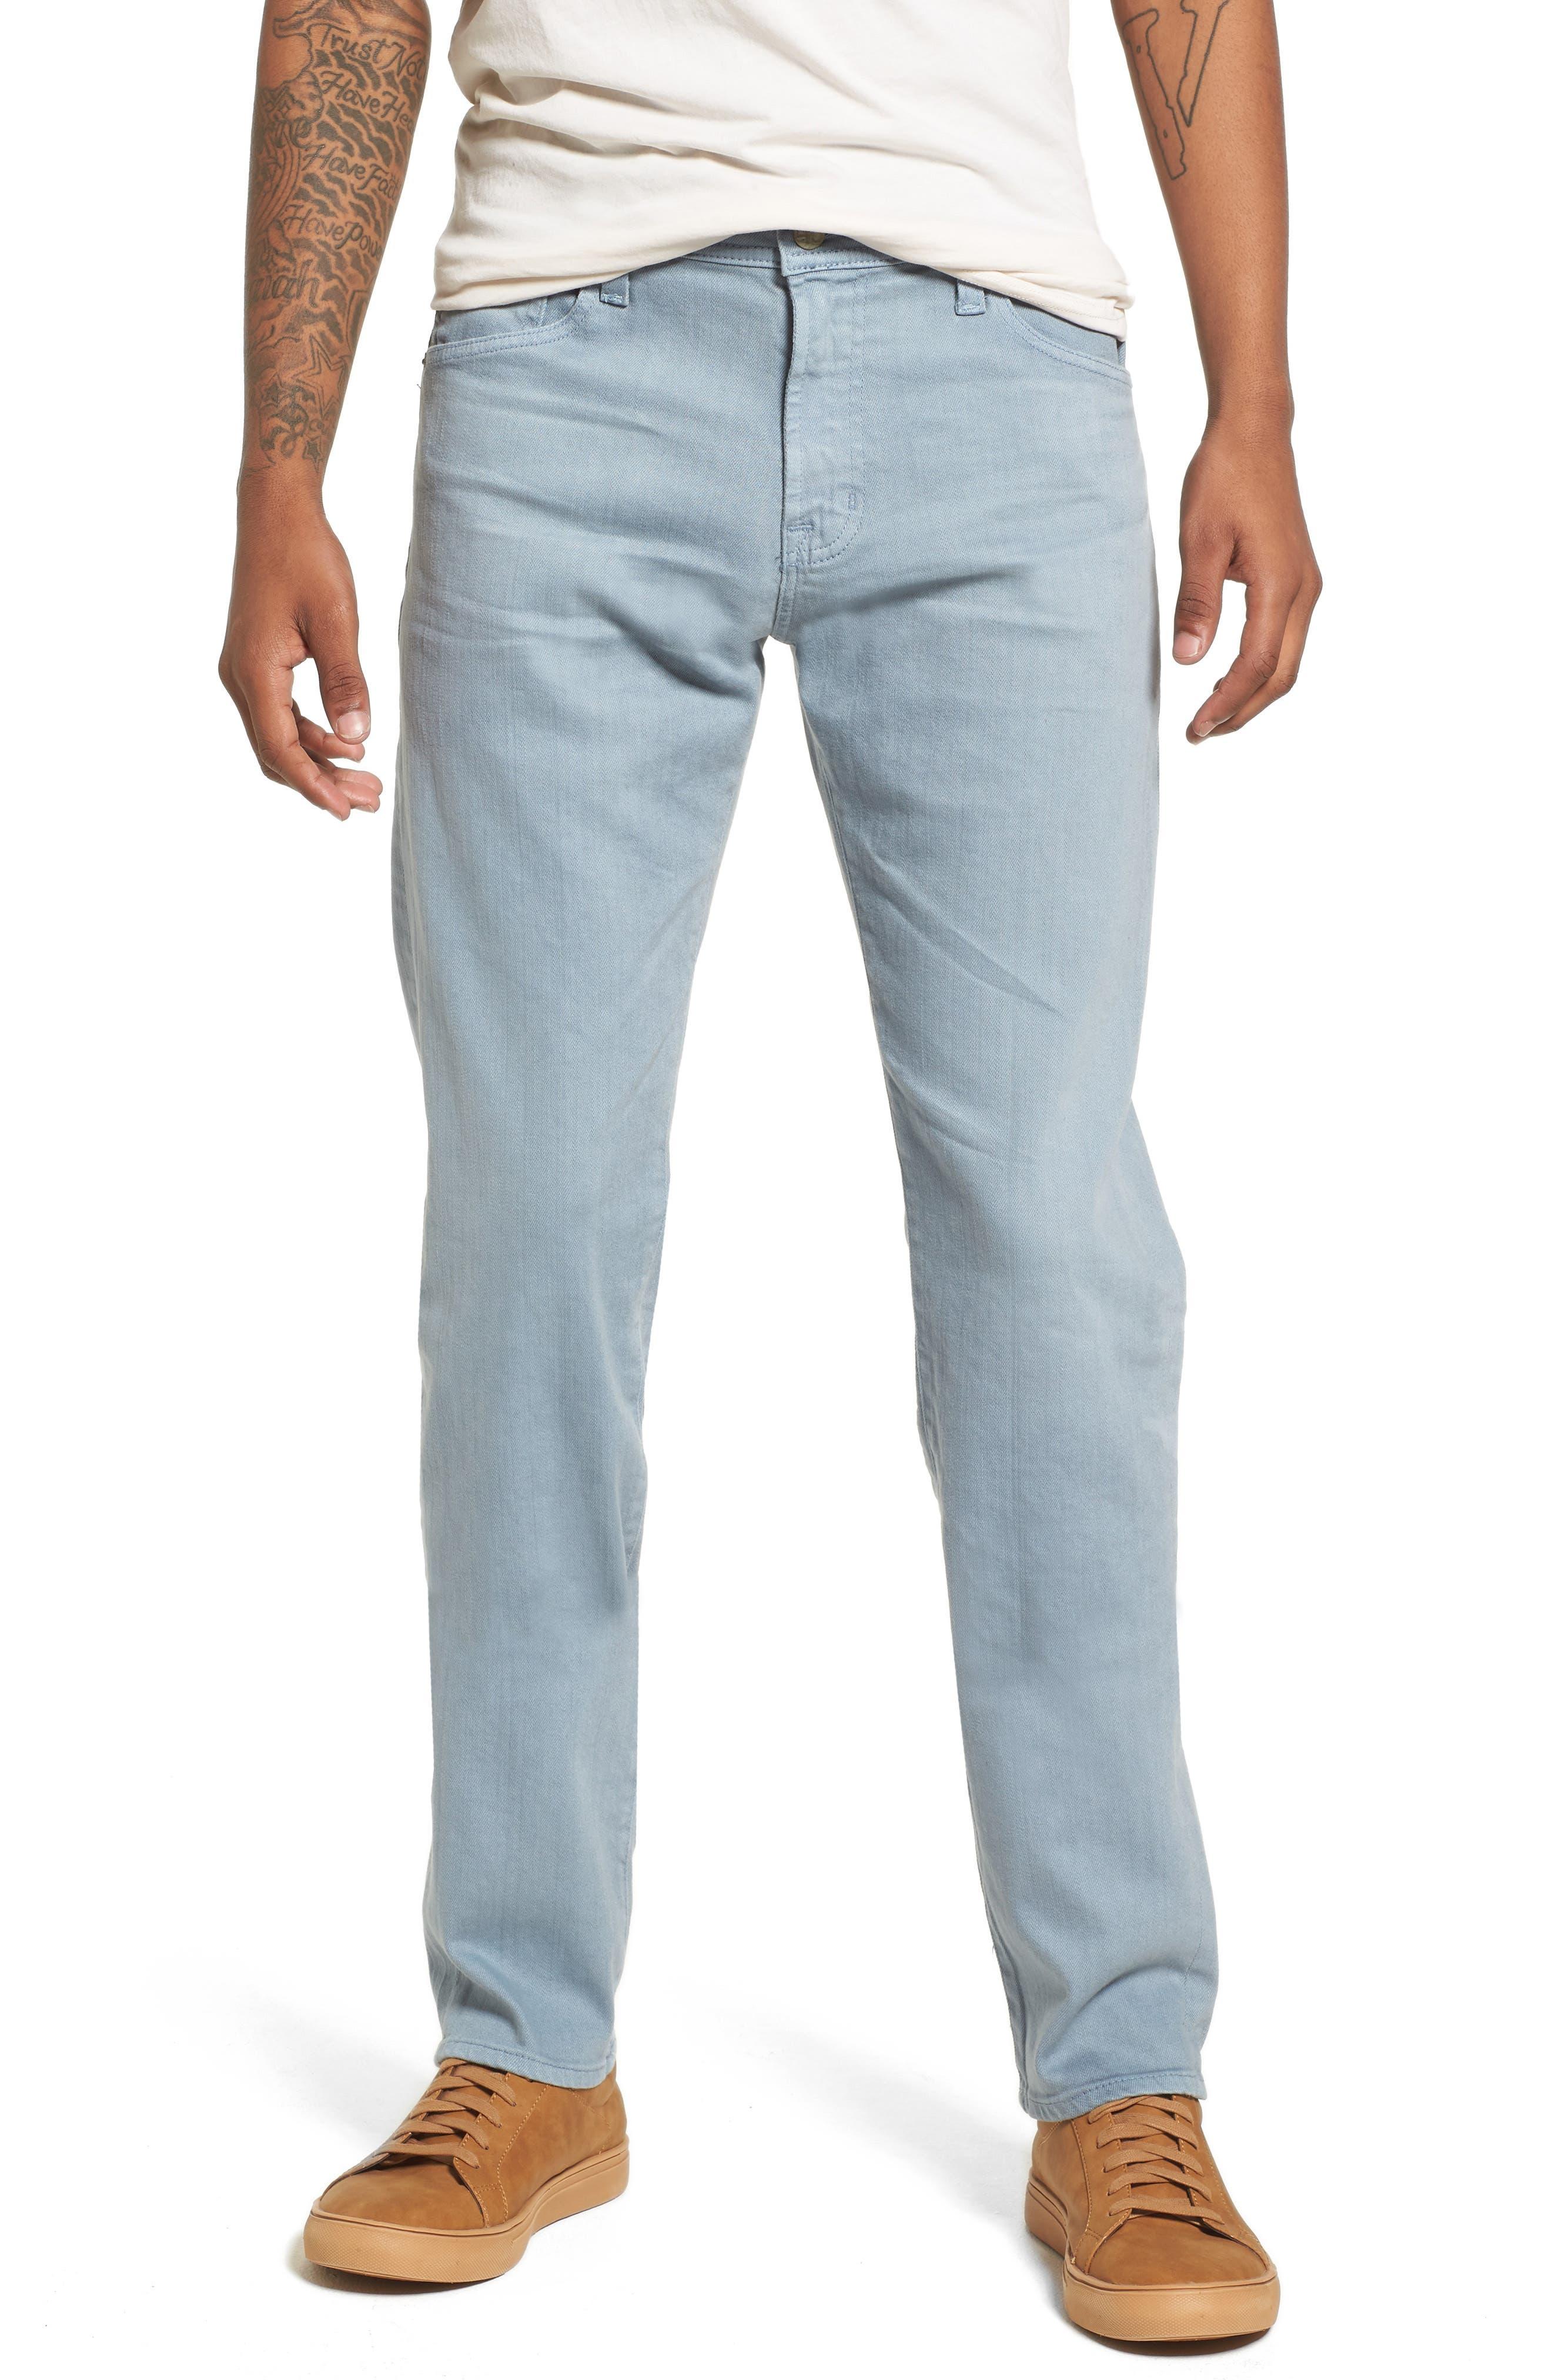 Tellis Slim Fit Jeans,                             Main thumbnail 1, color,                             7 Years Ocean Mist